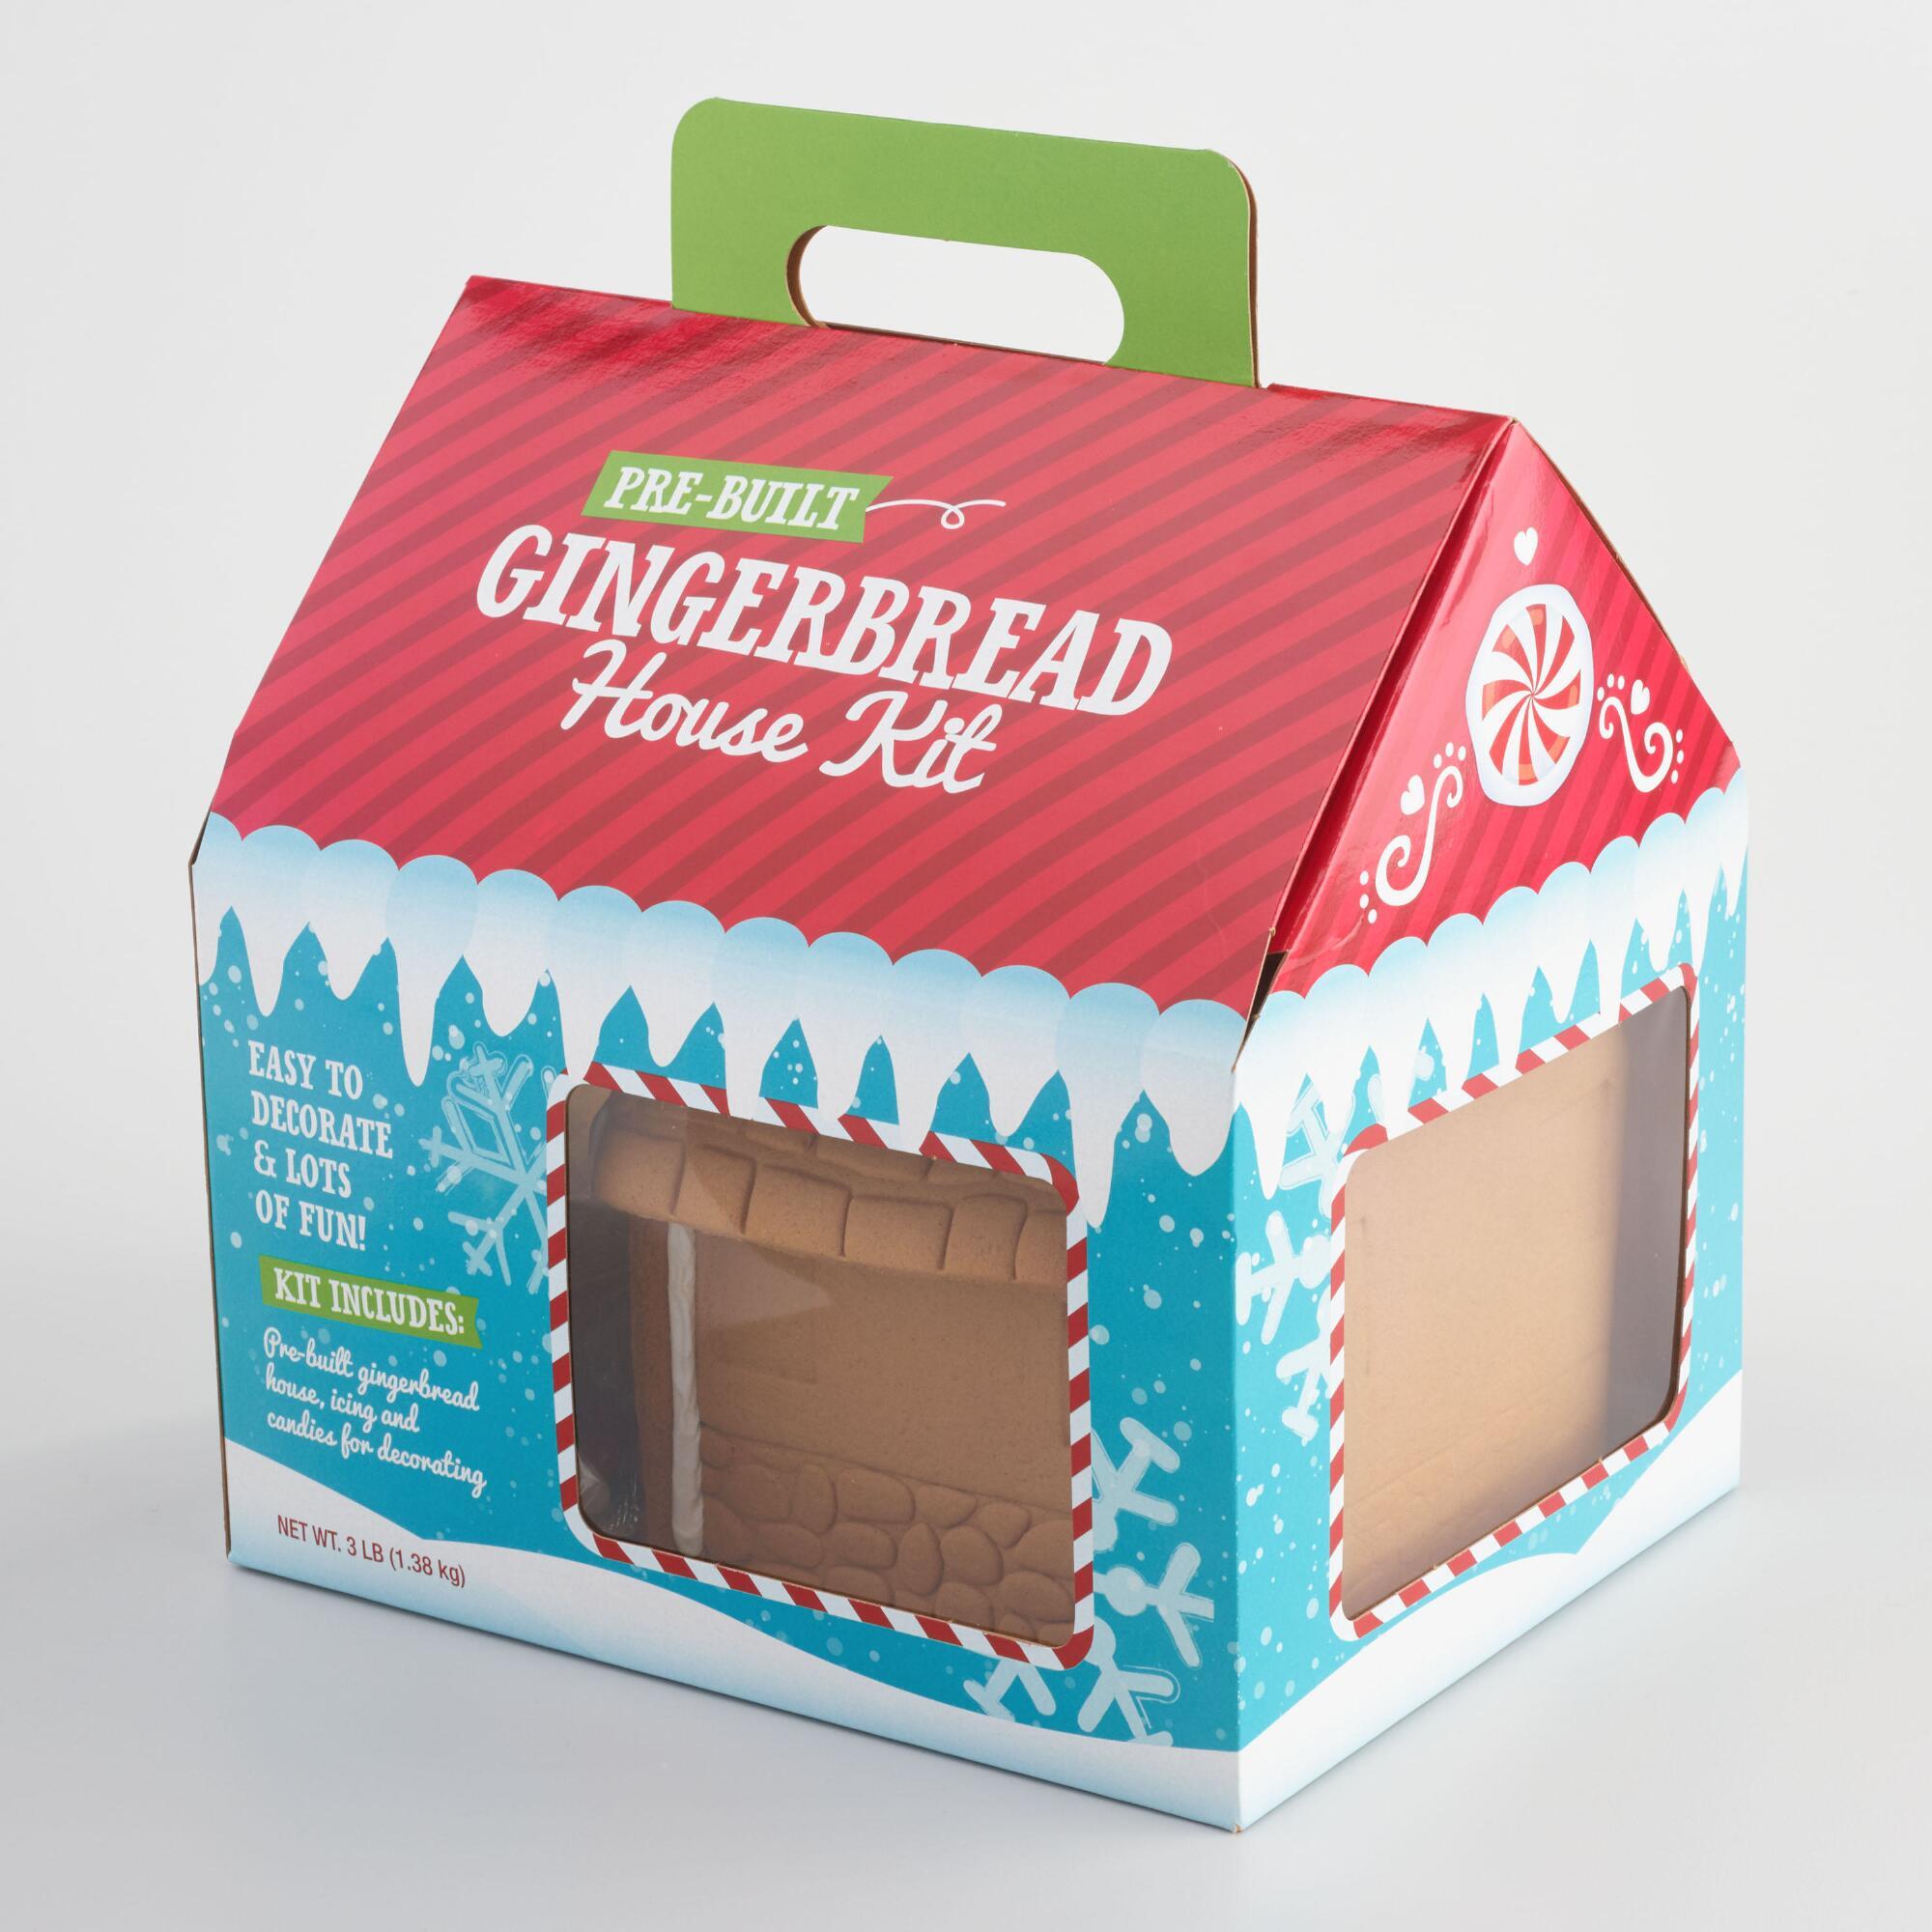 Prebuilt Gingerbread House Kit $19.99